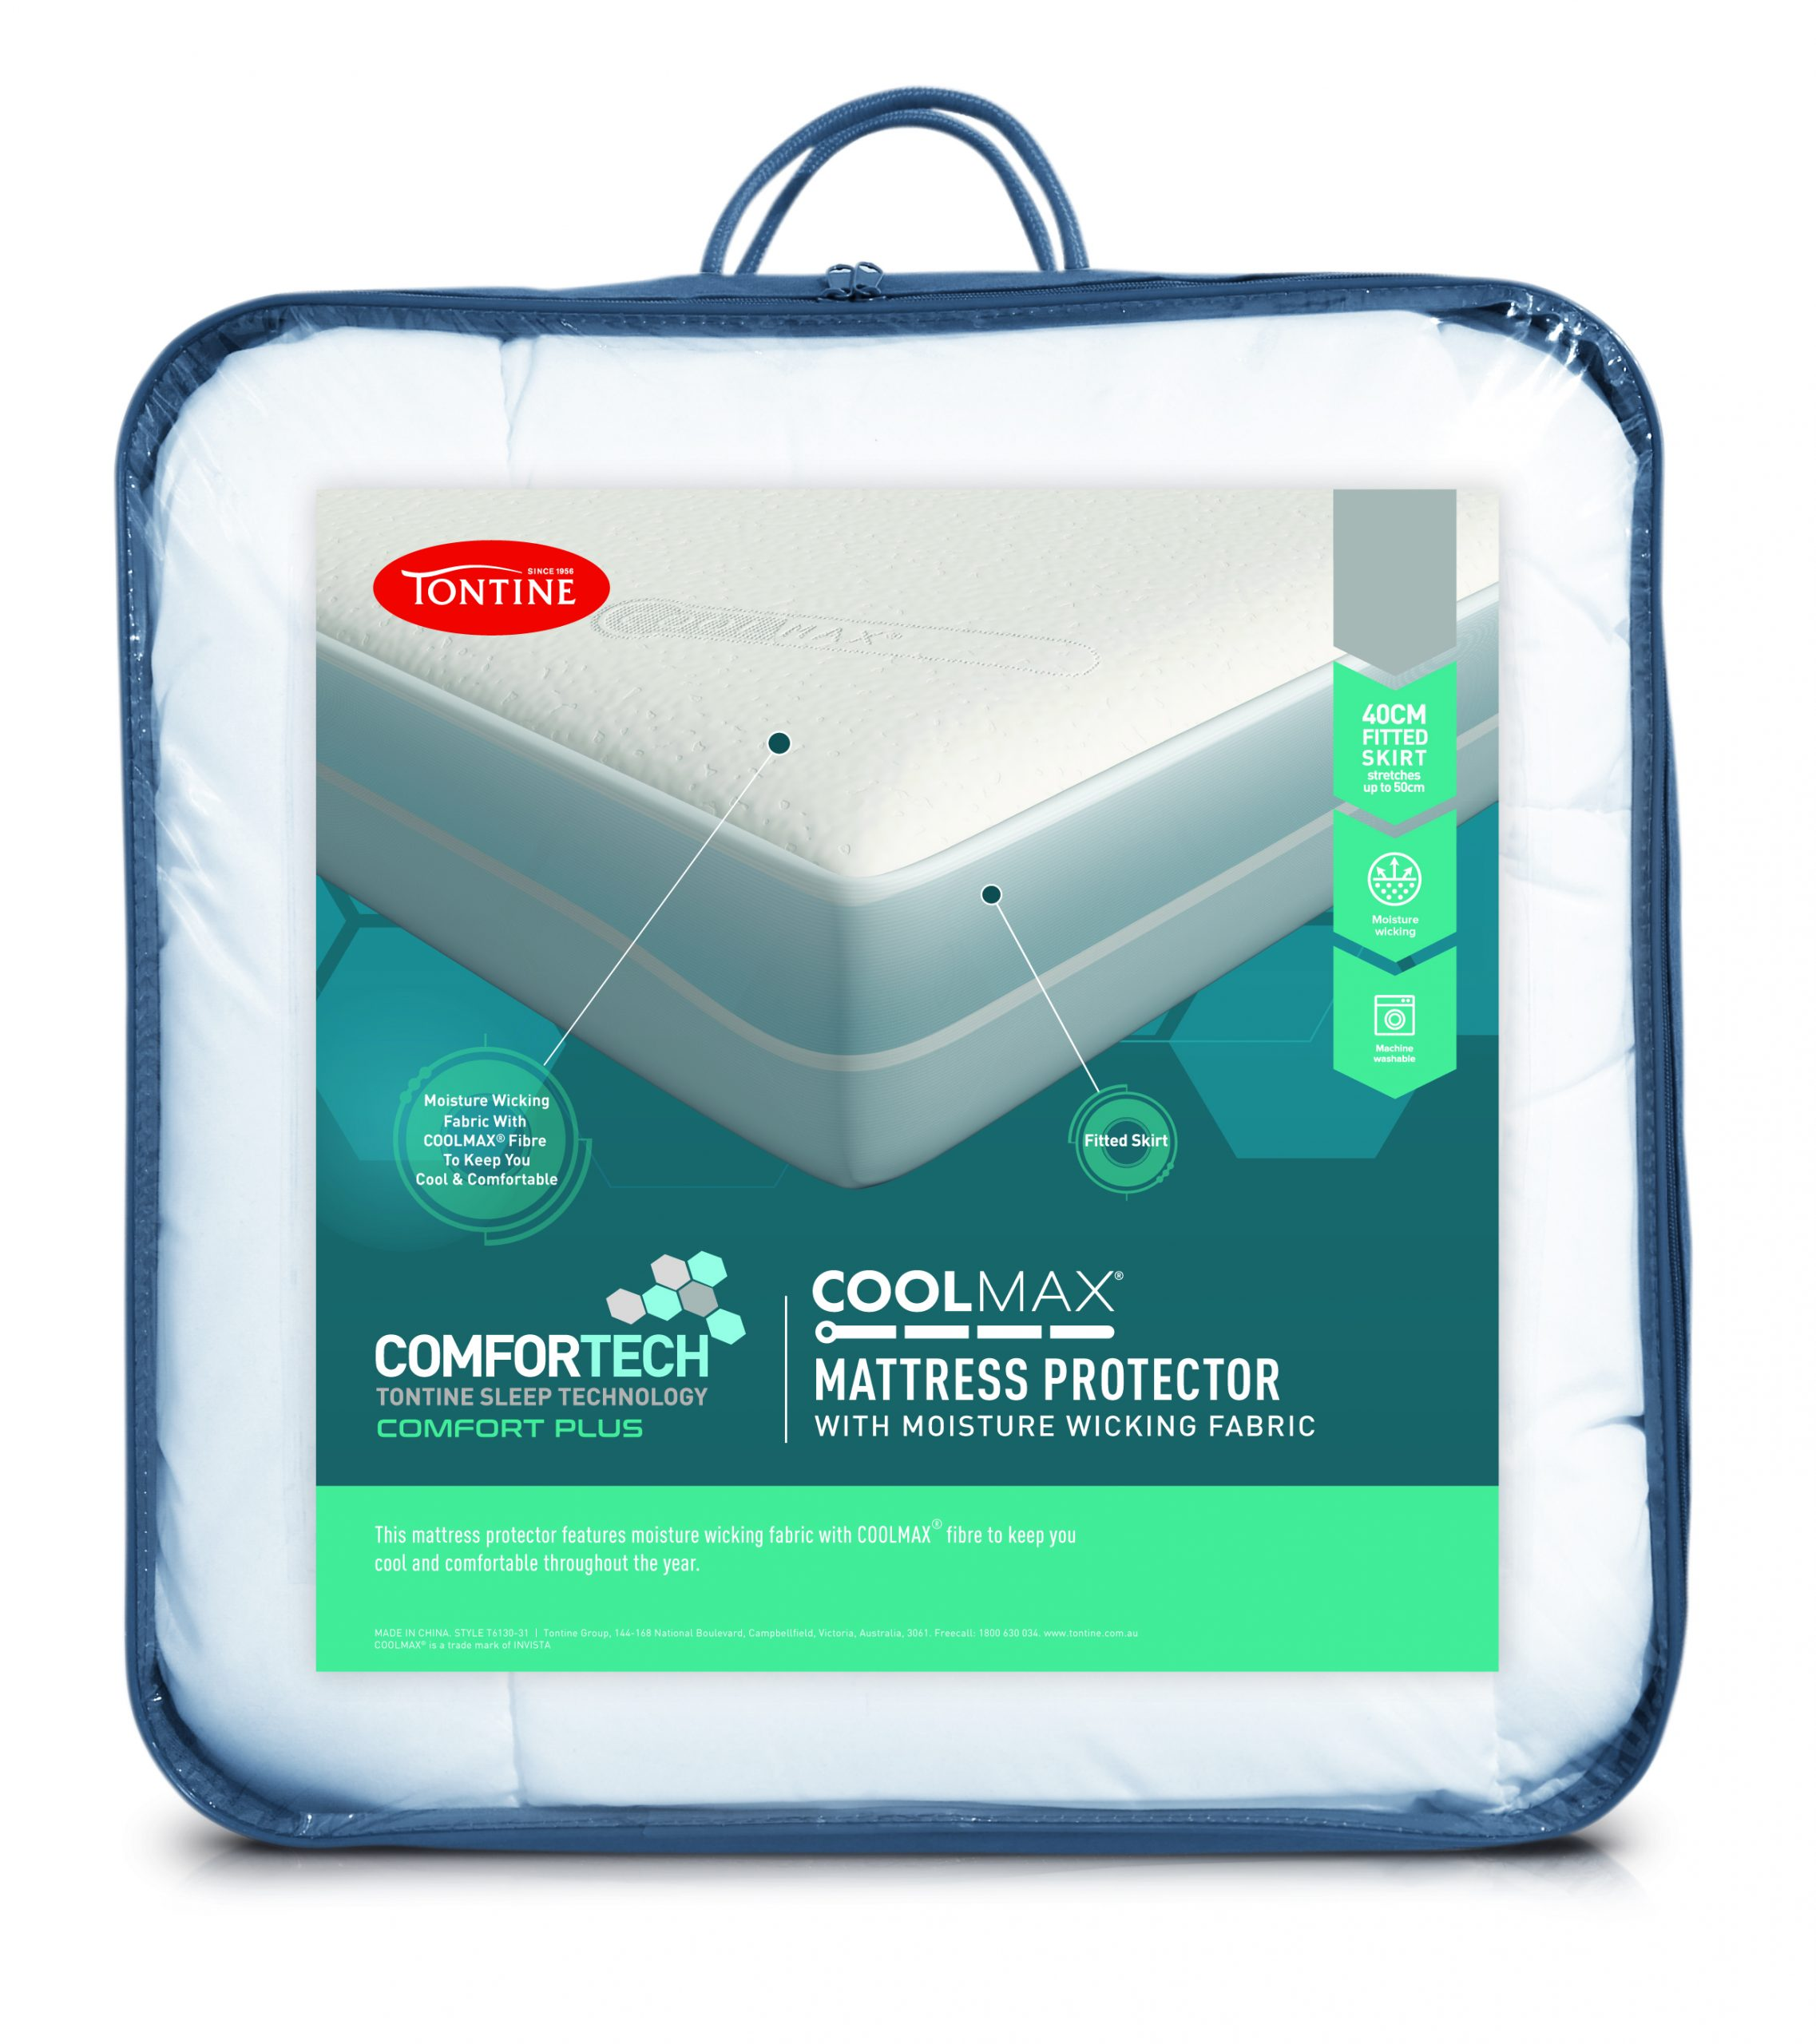 Tontine Comfortech Coolmax Mattress Protector